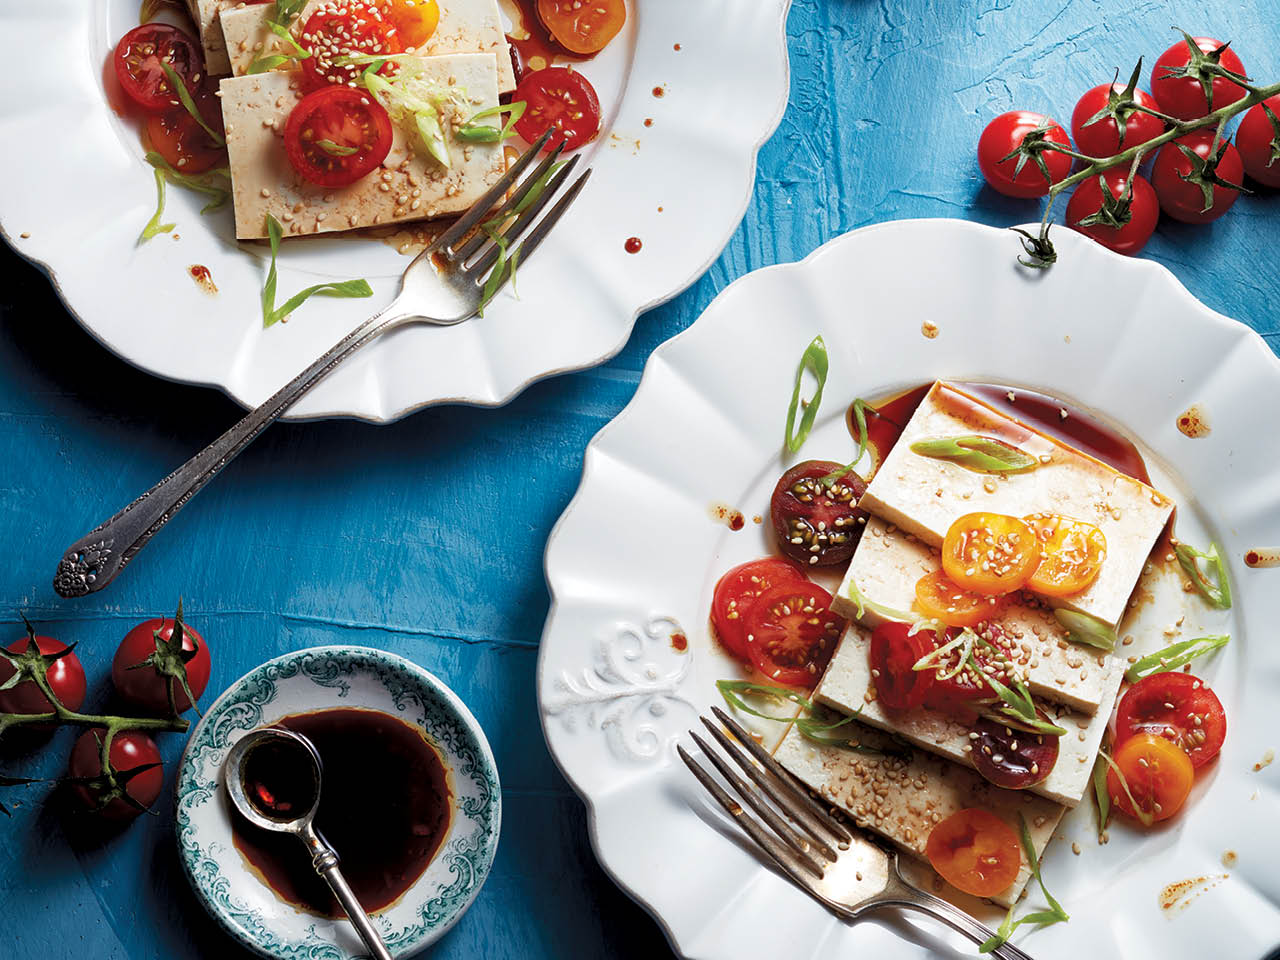 tomato and tofu starter